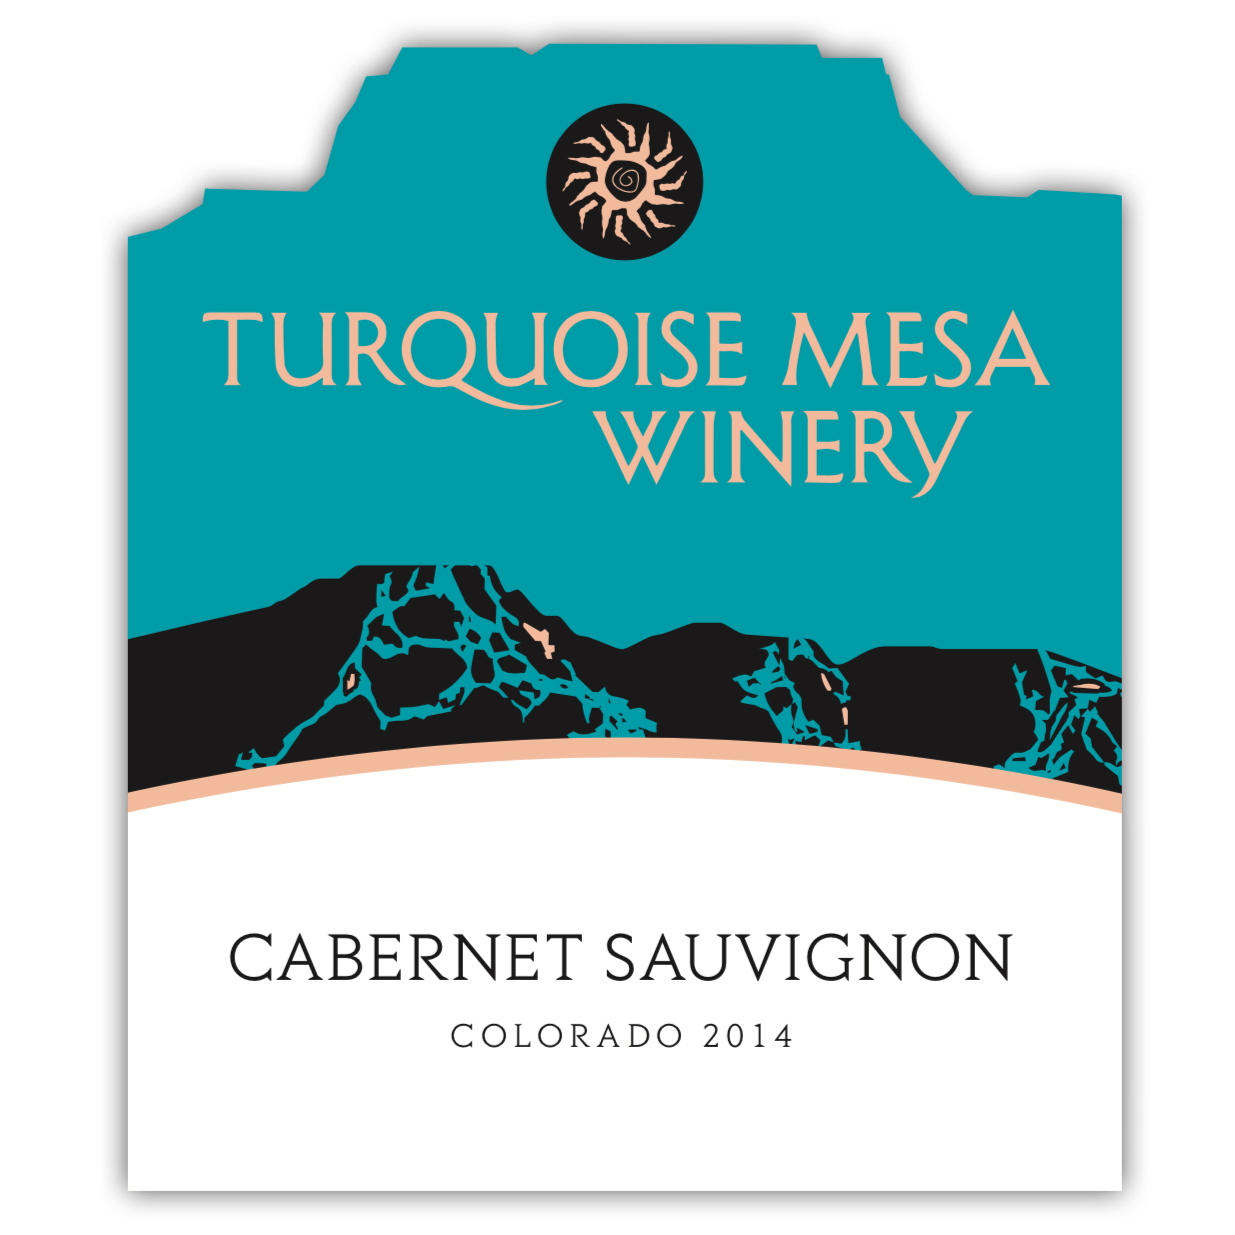 Turquoise Mesa wine label